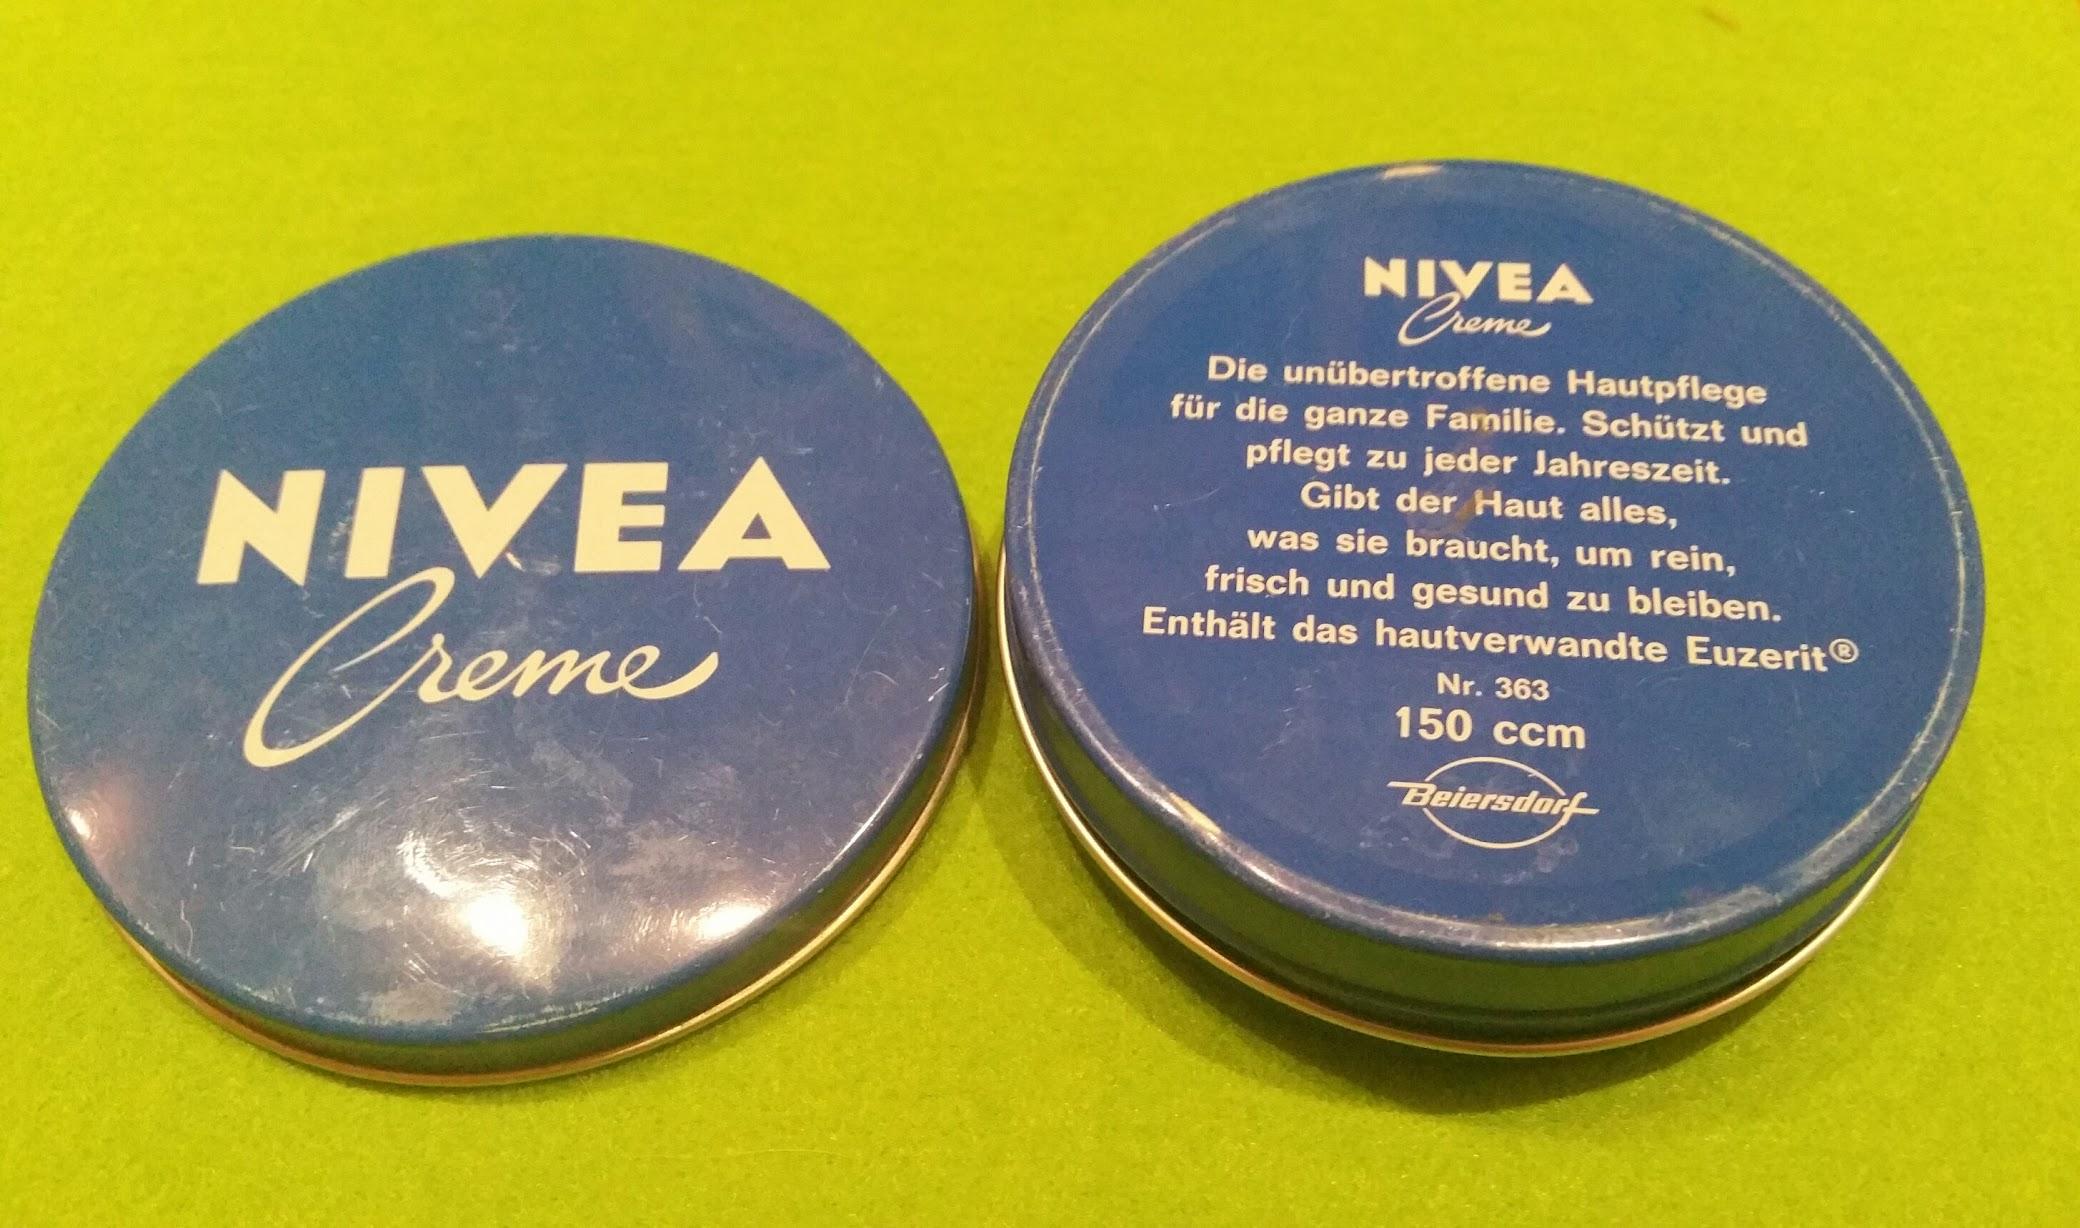 Nivea-Creme